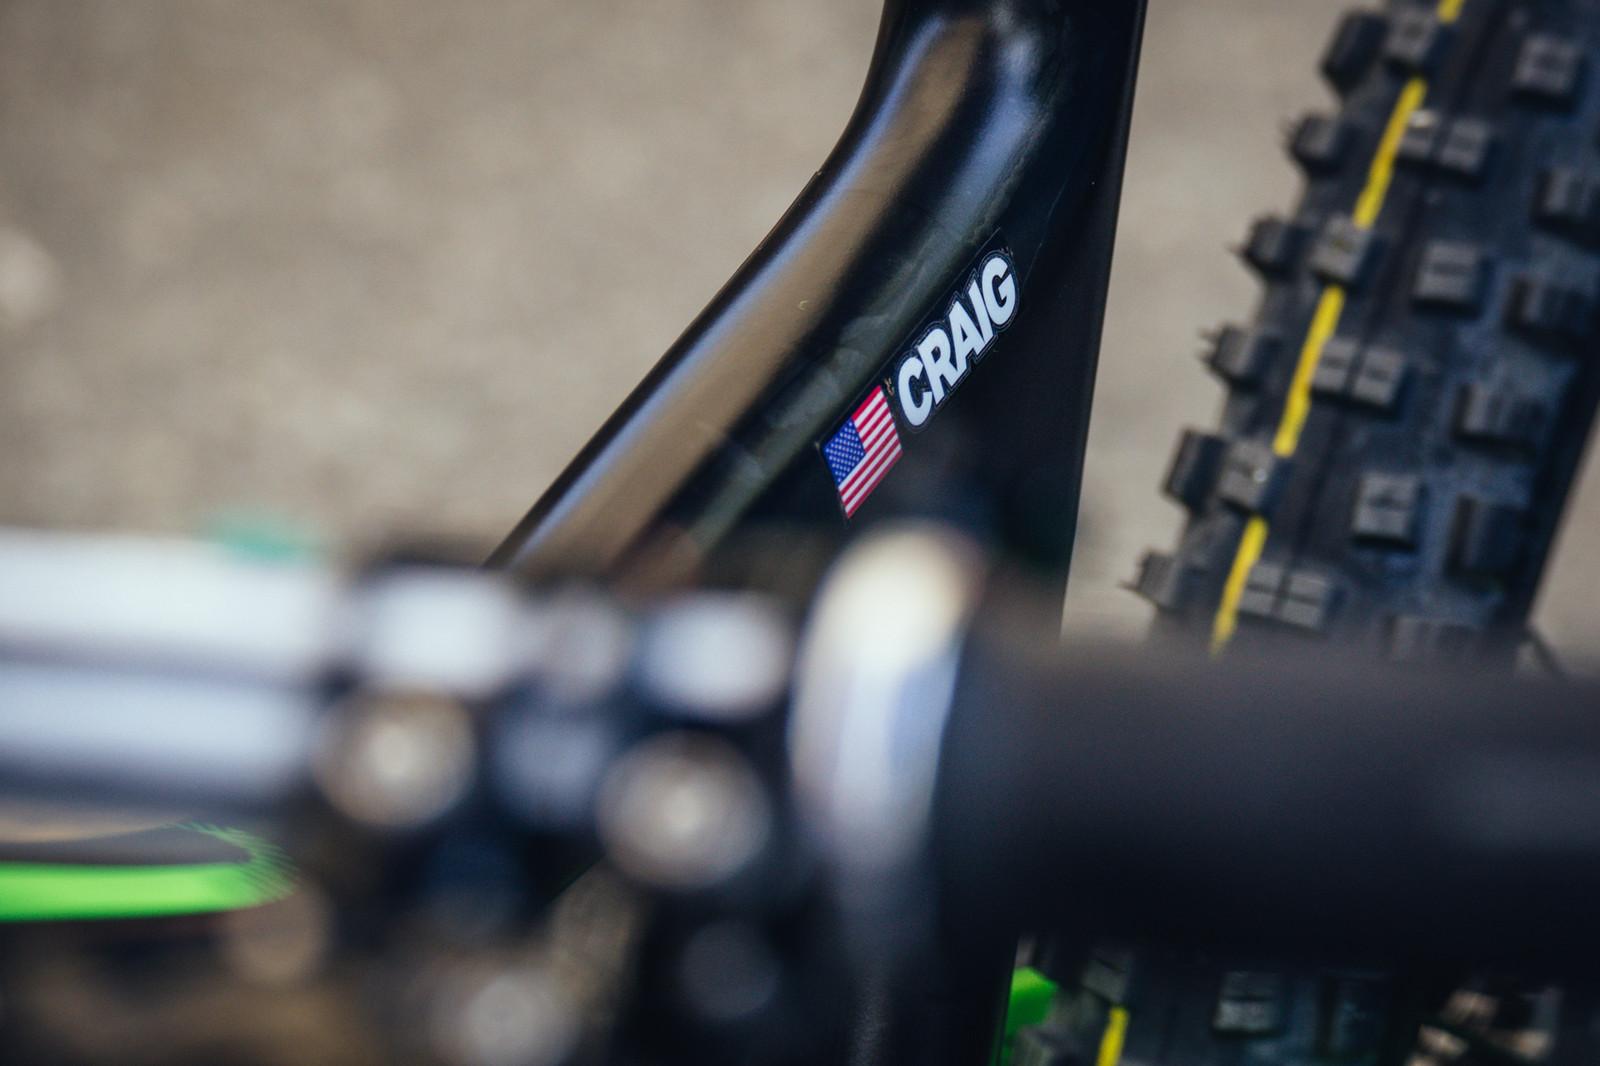 Adam Craig's Giant Trance Advanced - PIT BITS - Enduro World Series, Whistler - Mountain Biking Pictures - Vital MTB